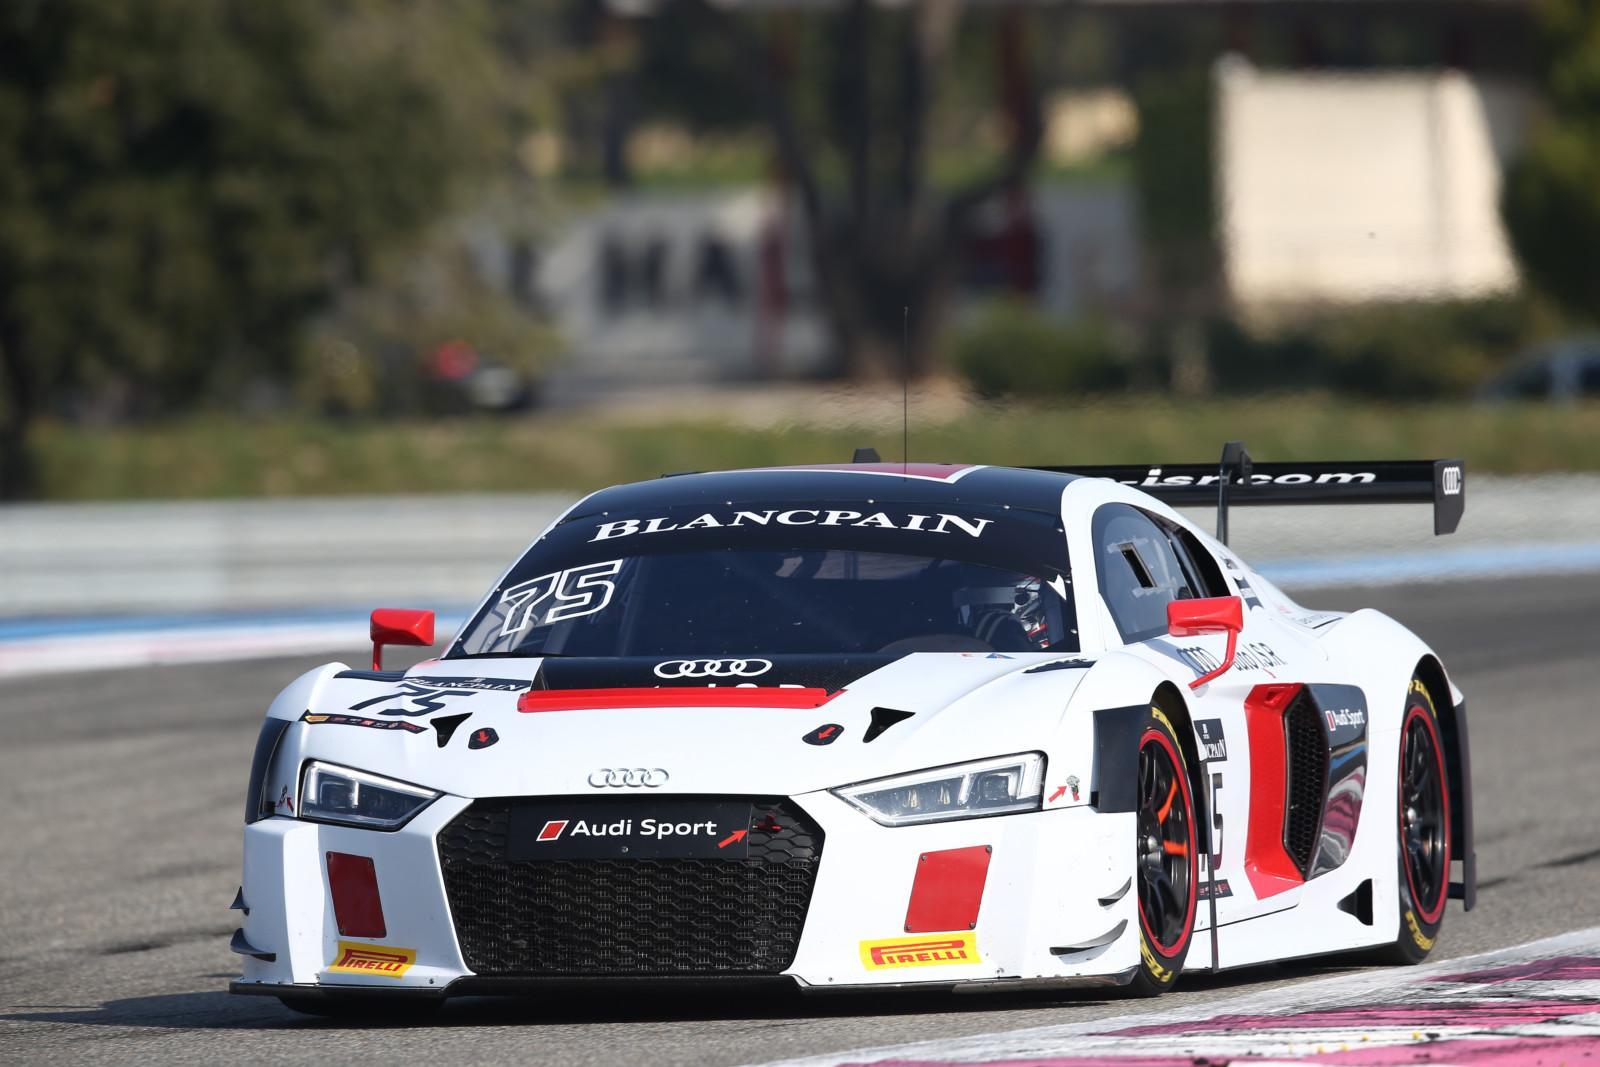 Audi ISR #75 Monza Free practice